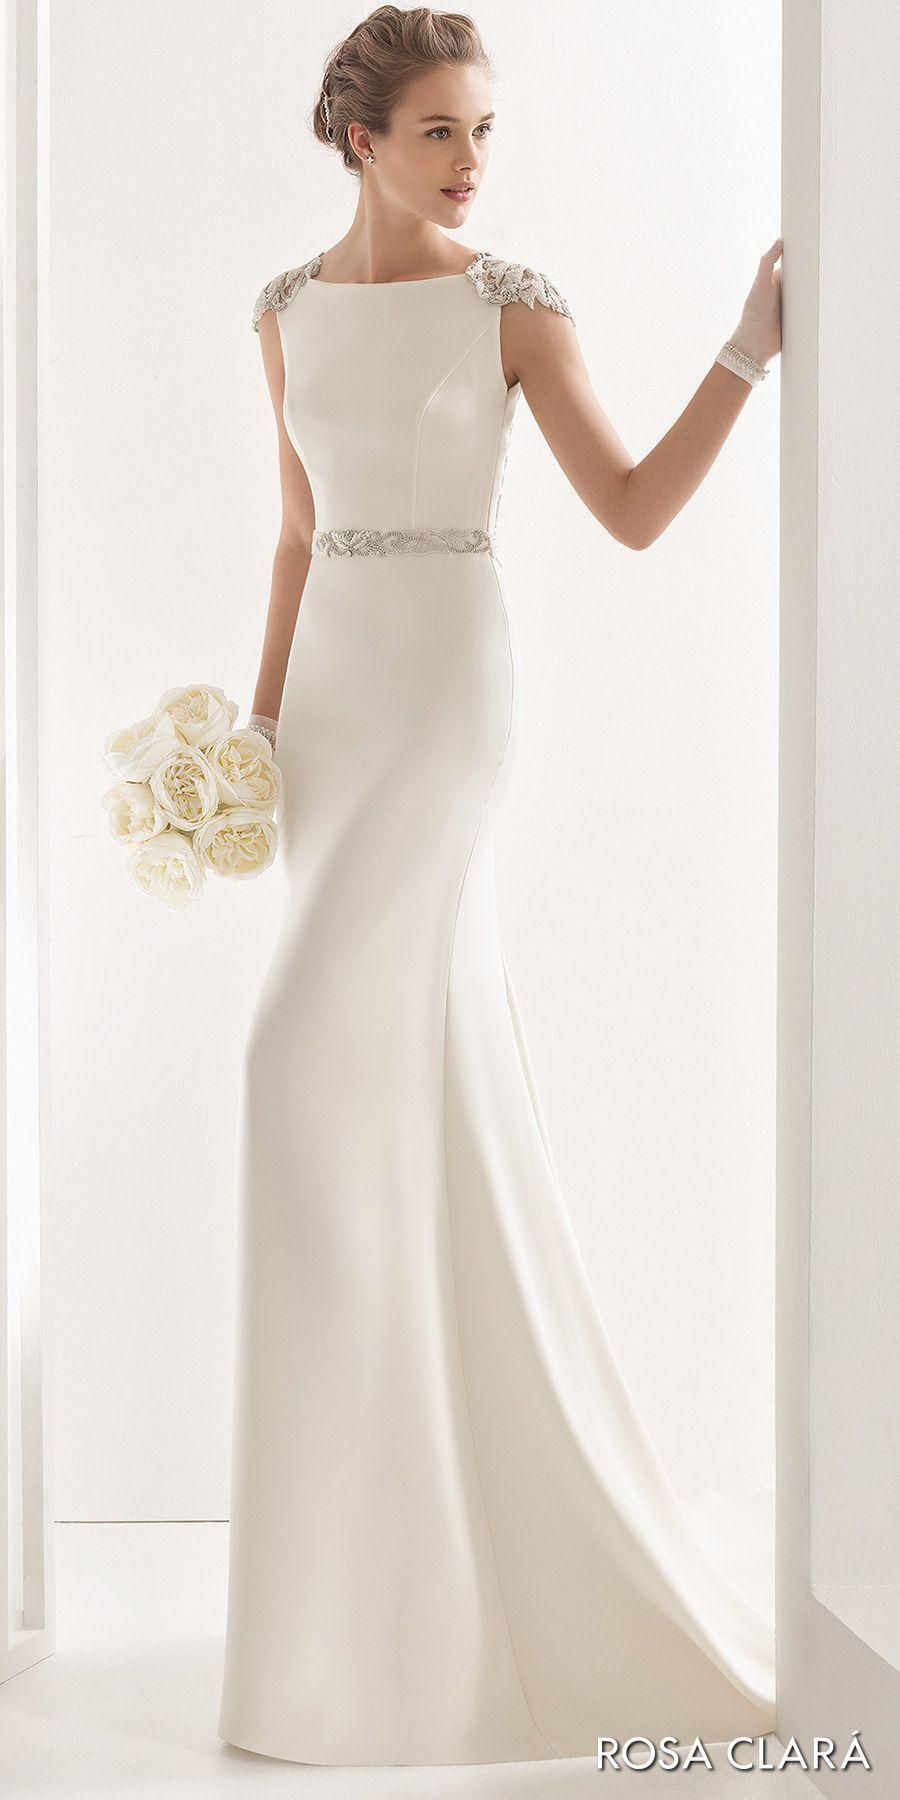 Rosa clara bridal embellished cap sleeves bateau neck simple